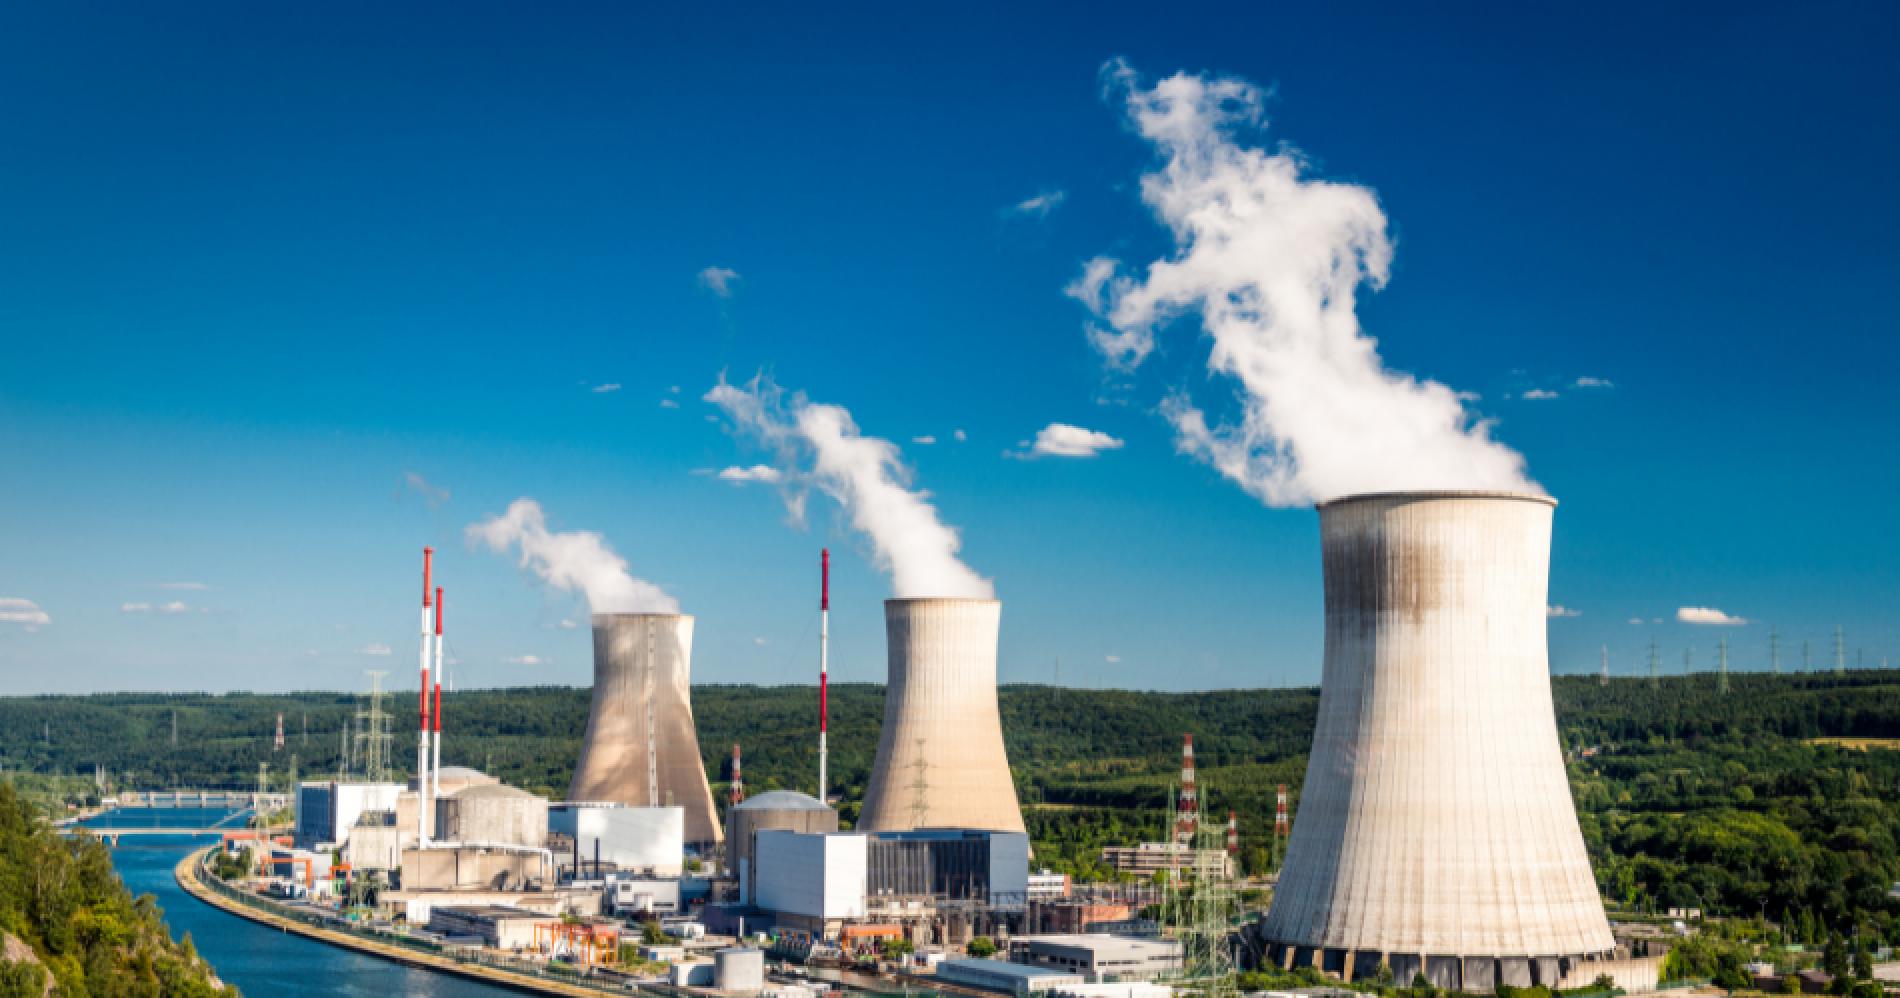 Nuclear Energy Illustration Web Bisnis Muda - Canva